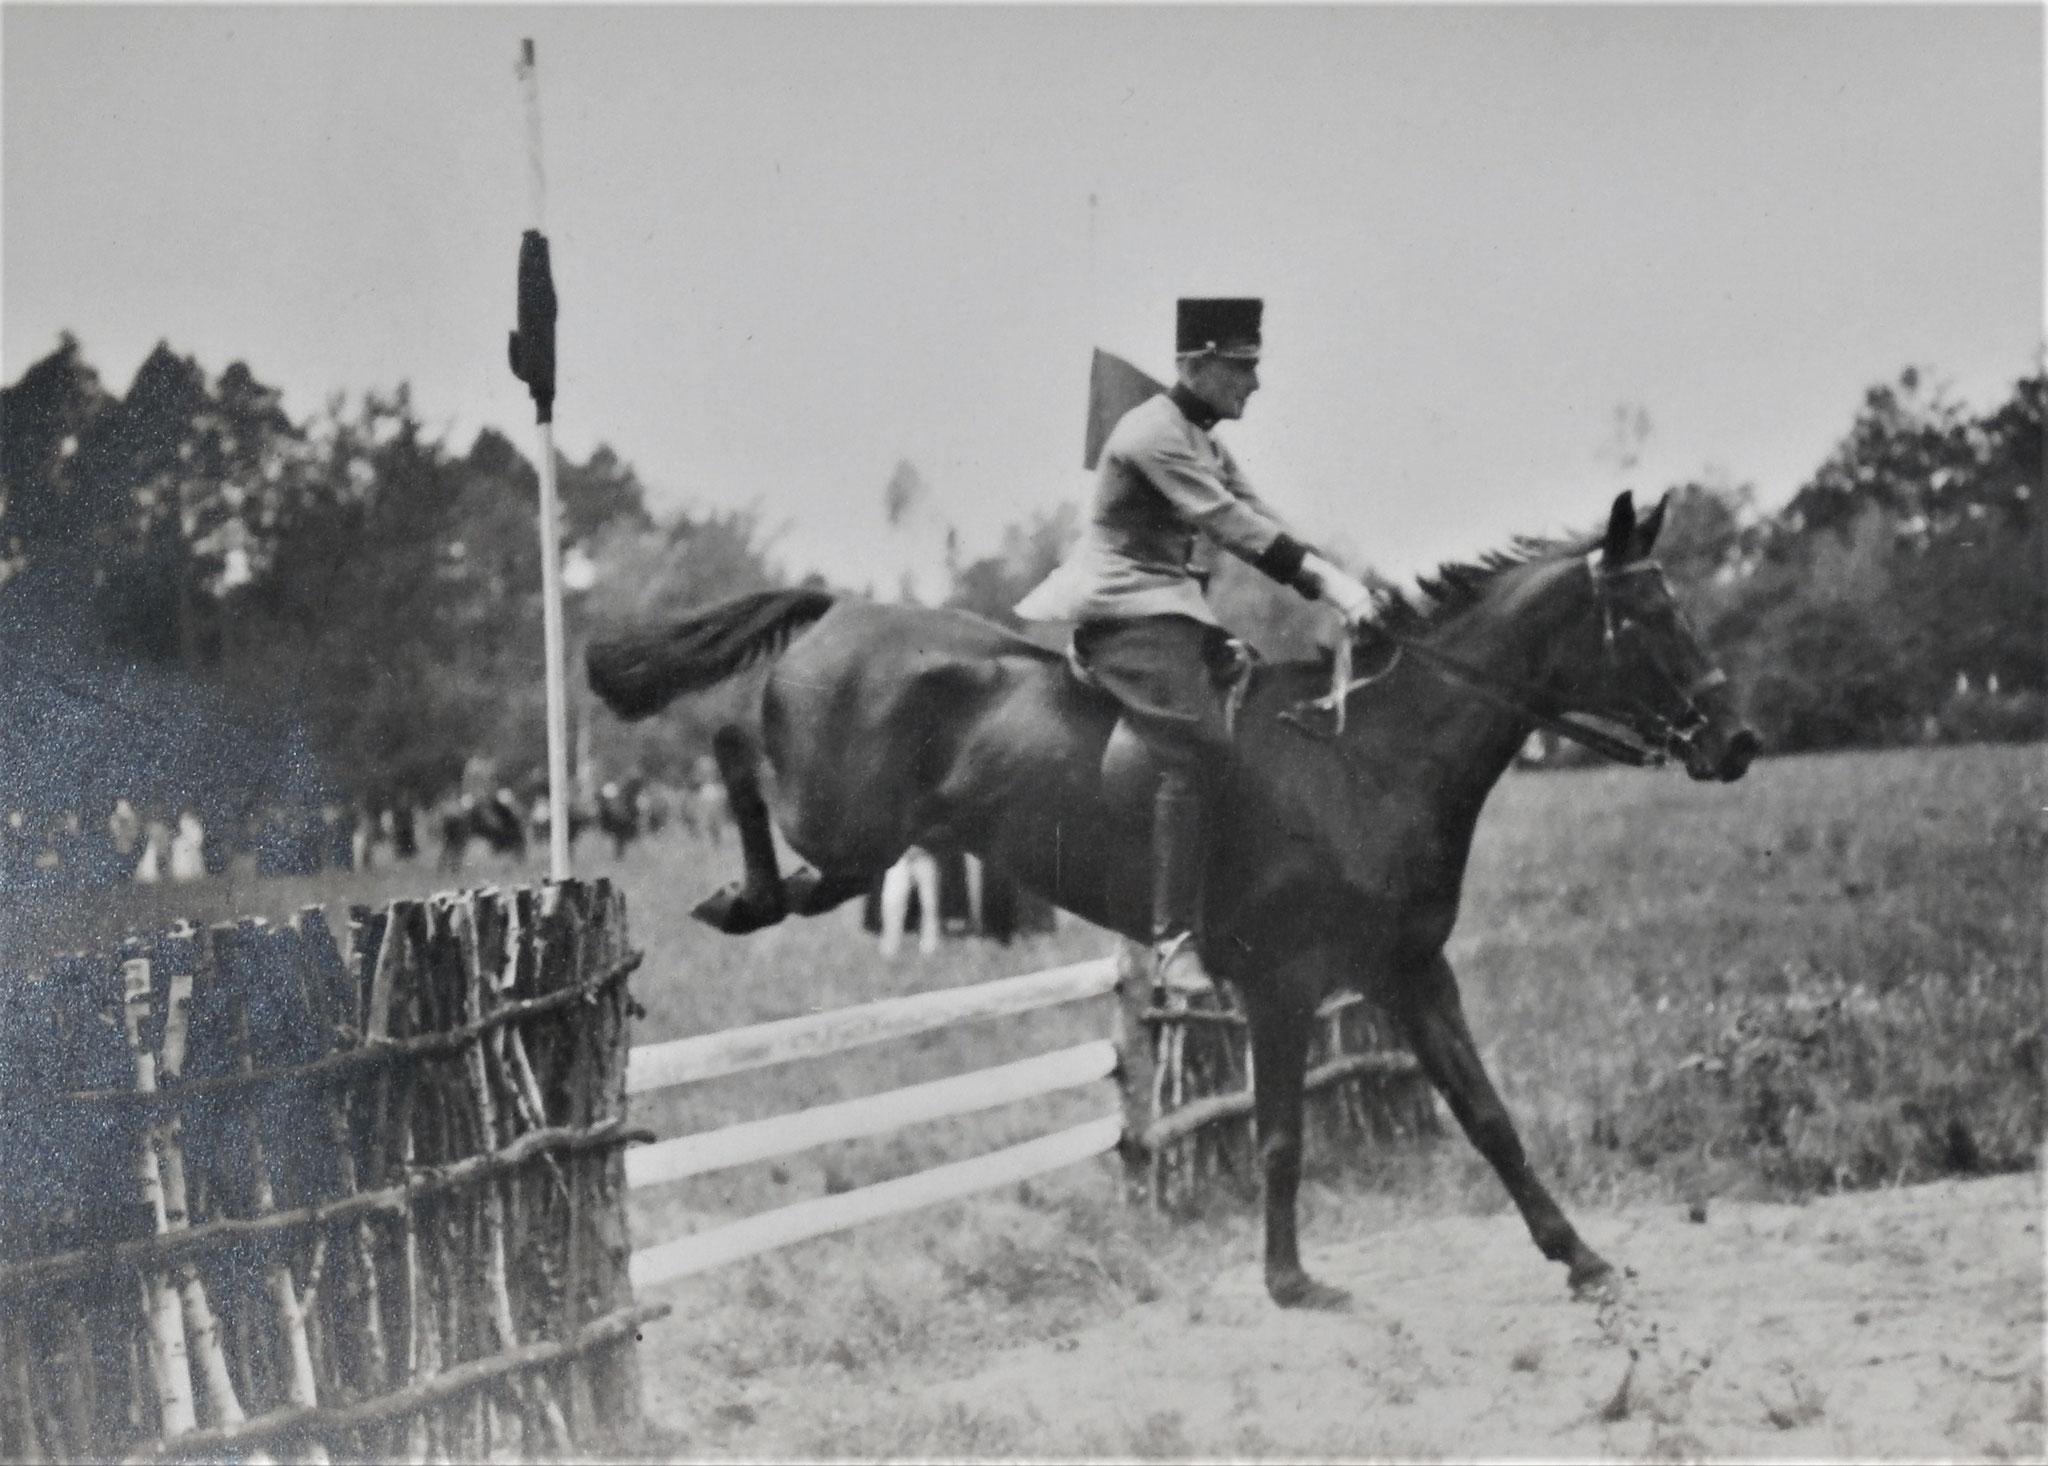 Leutnant Baron Hippsich